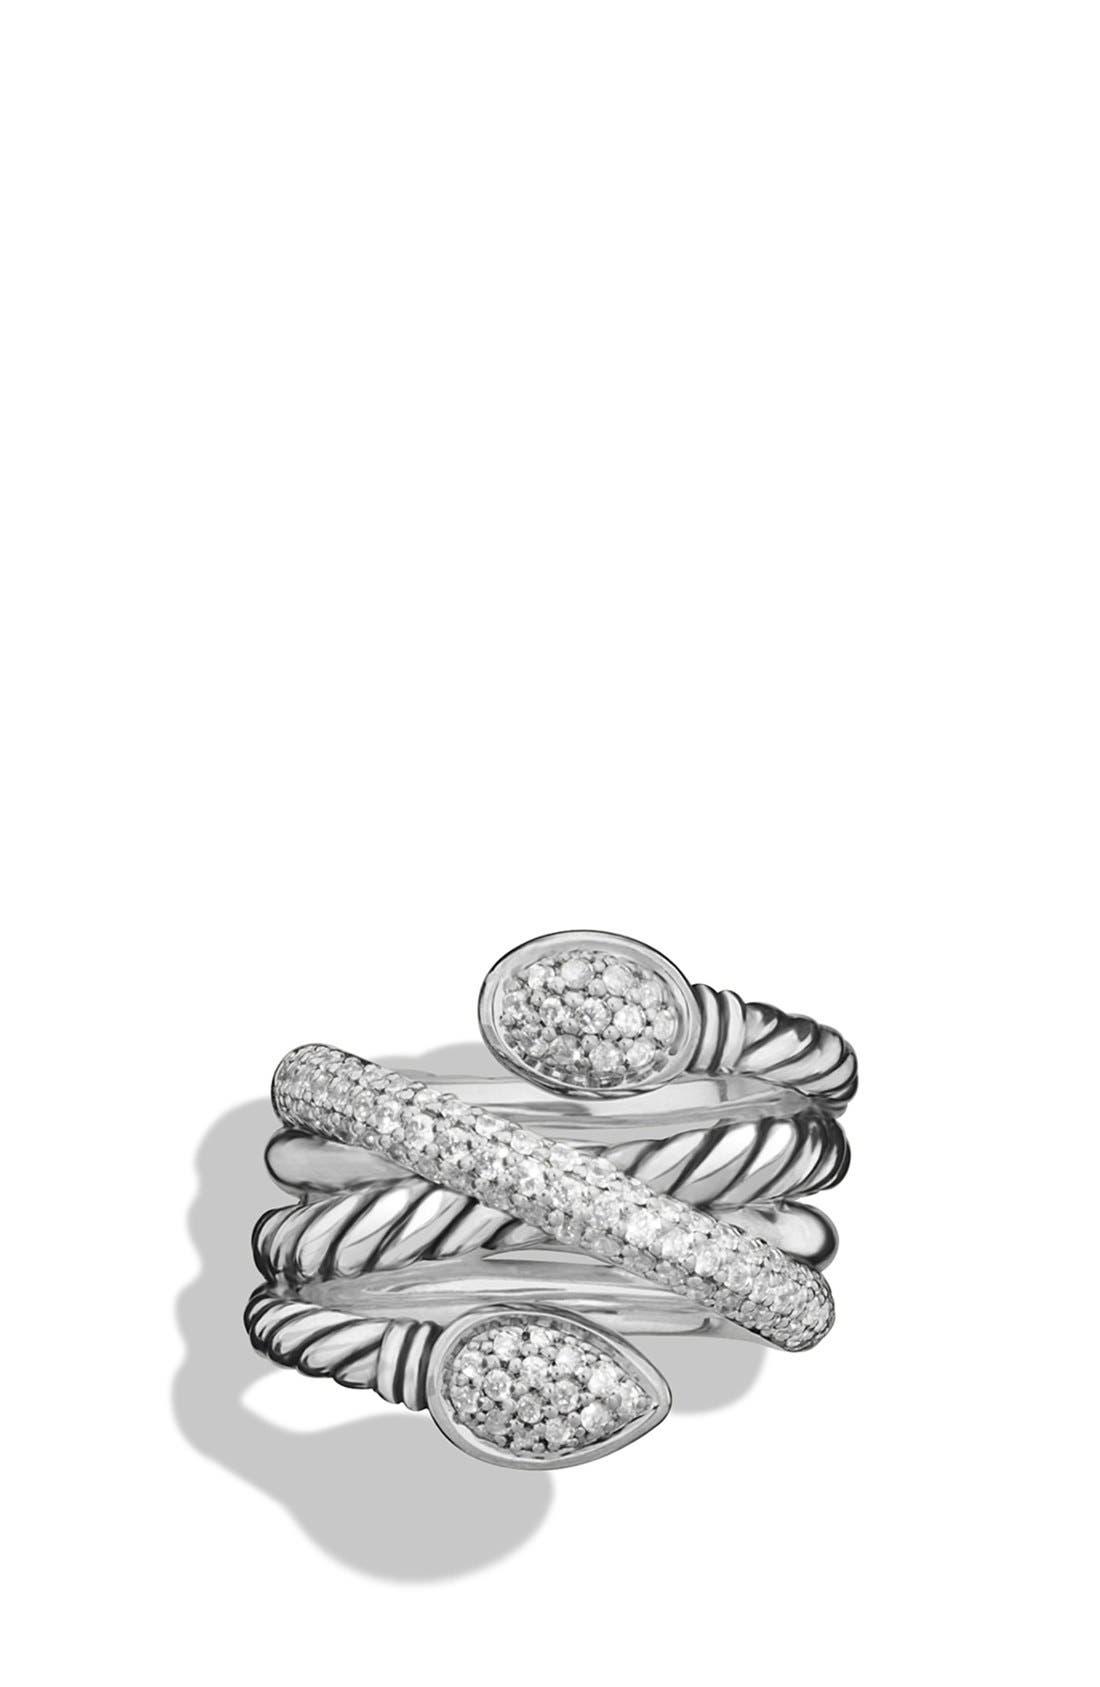 'Renaissance' Ring with Diamonds,                             Main thumbnail 1, color,                             040